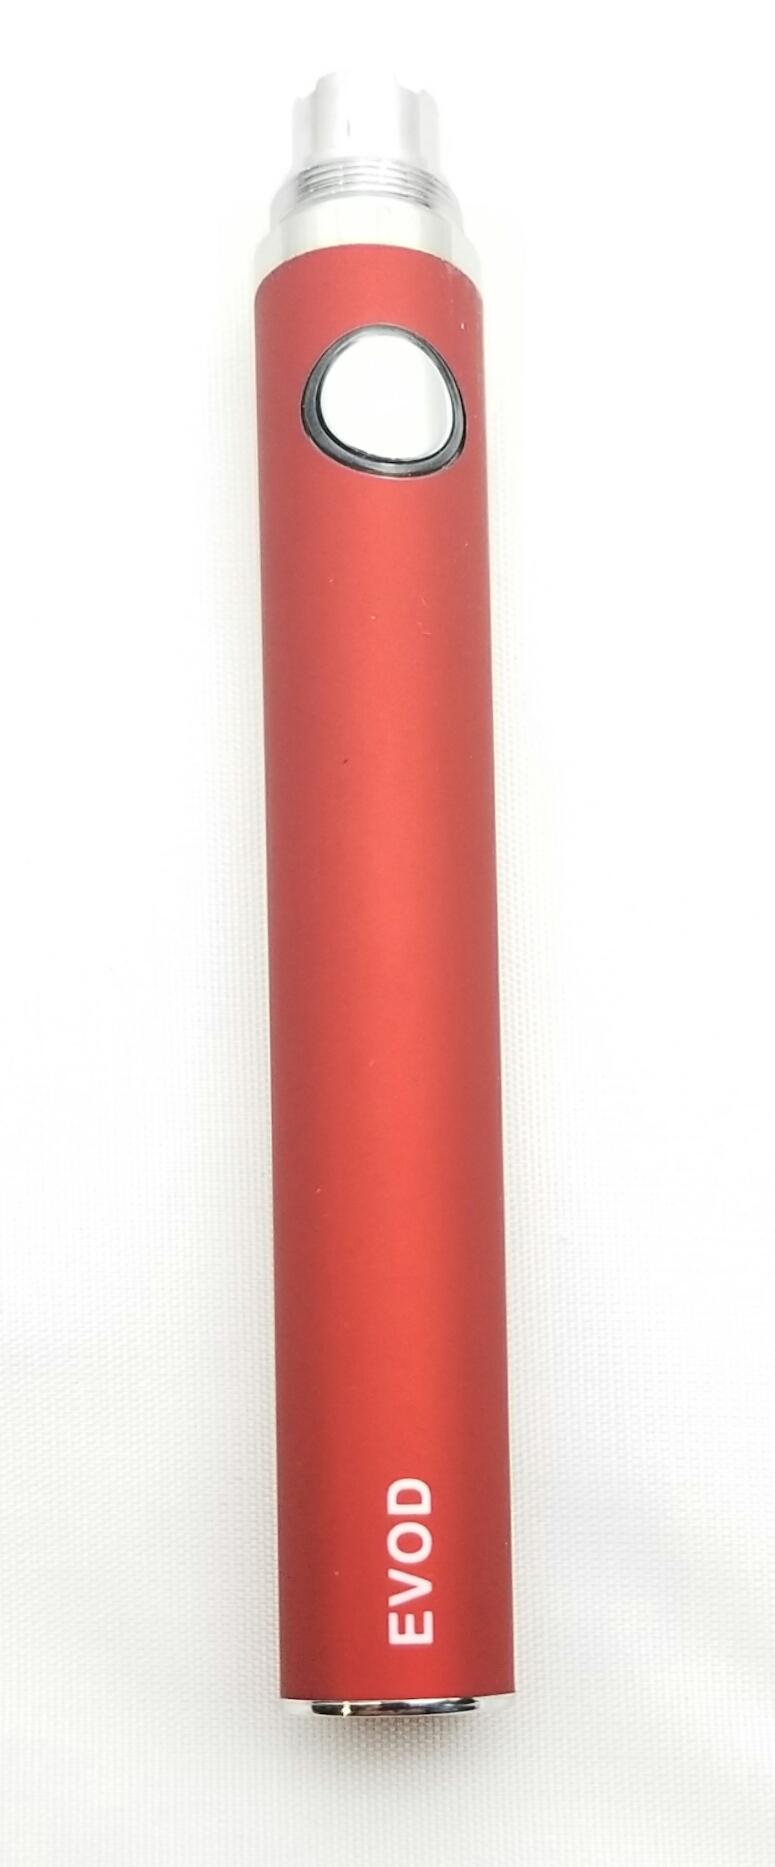 Mango - 1,000 mg cartridge